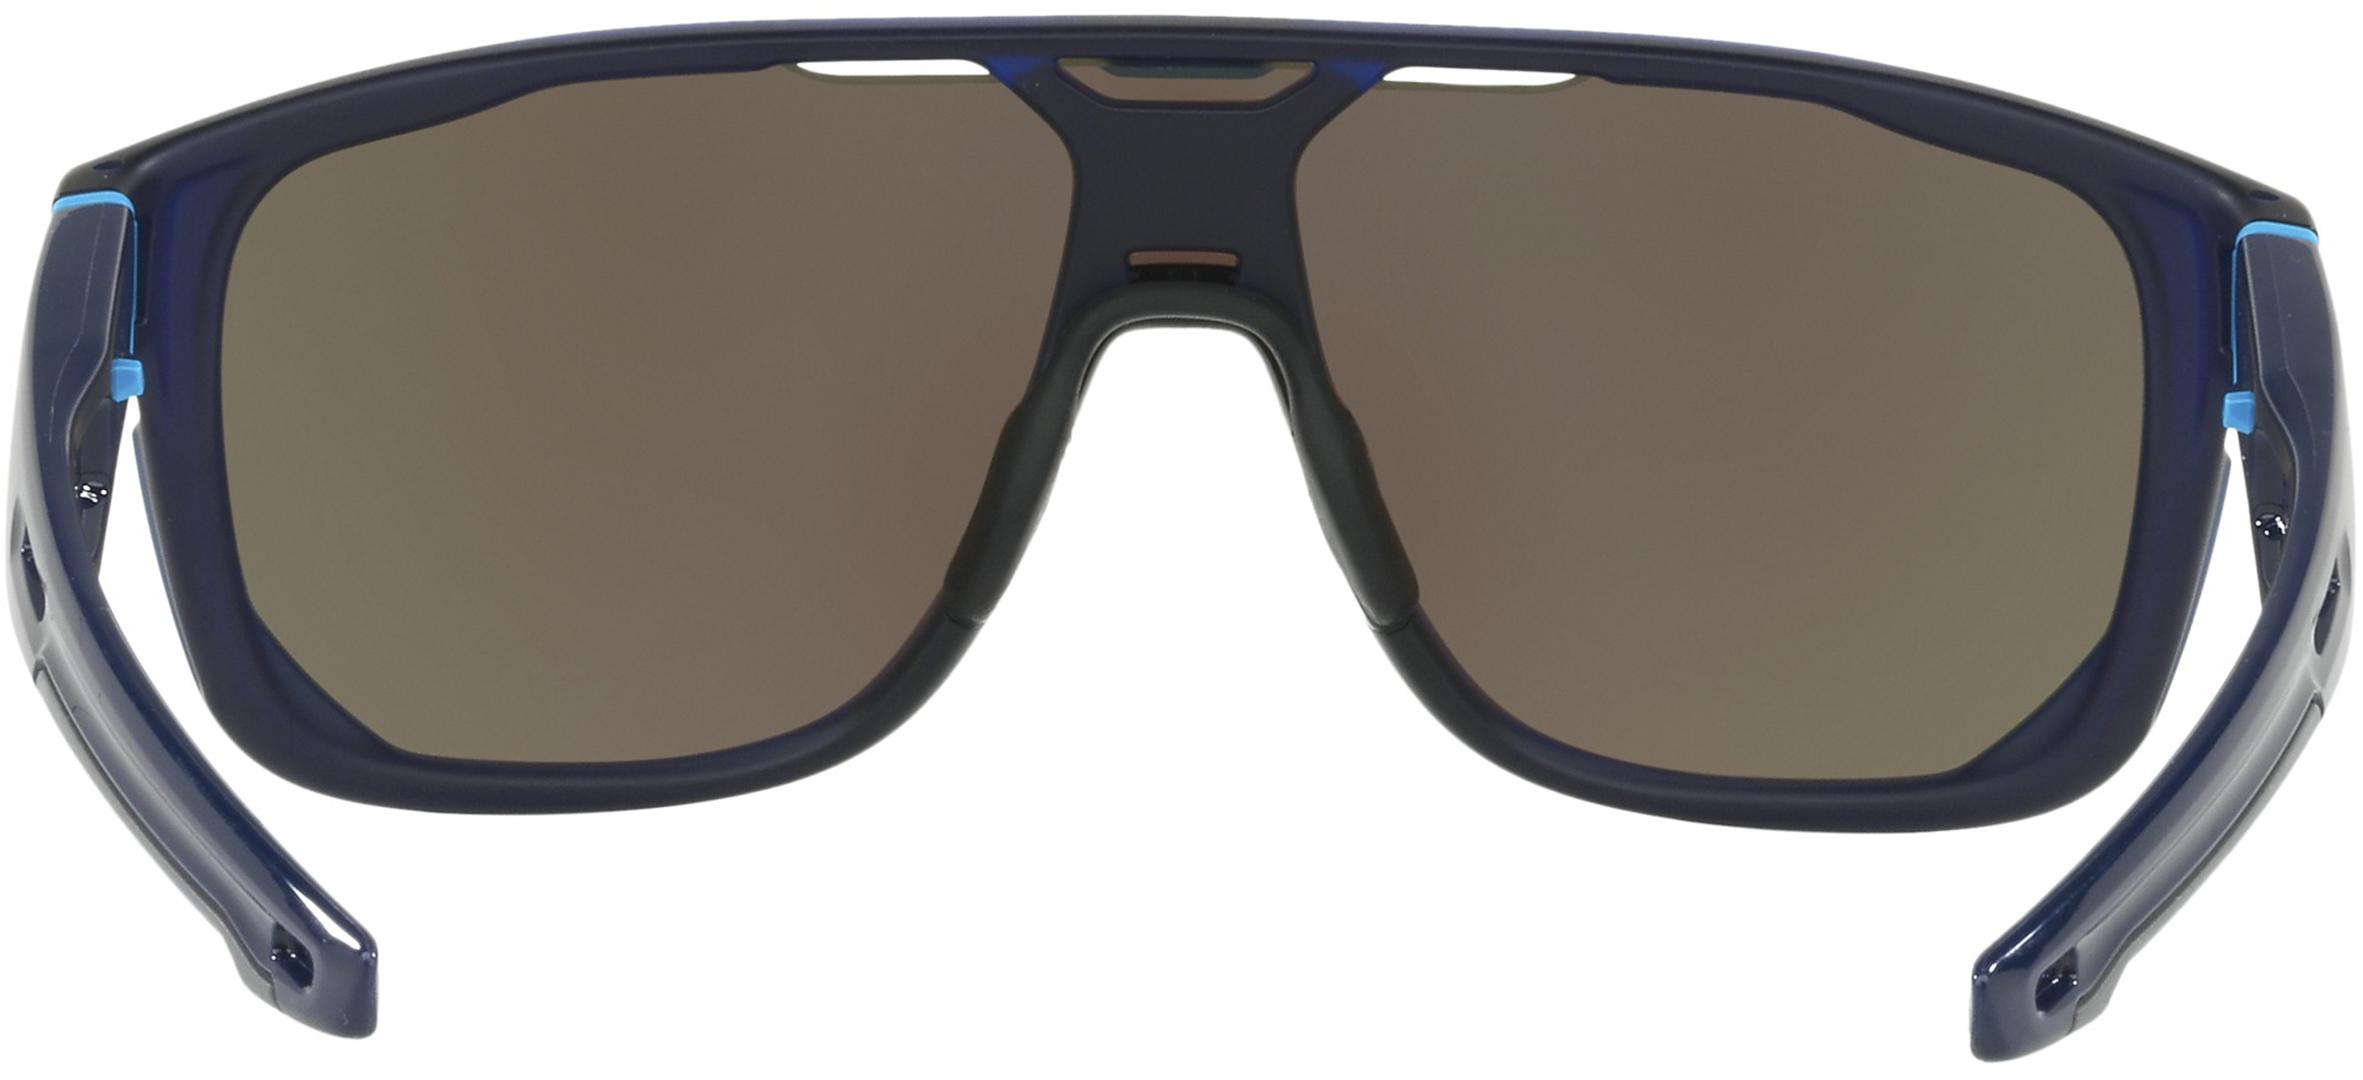 d3a4a77e7c Oakley Crossrange Blue Prizm